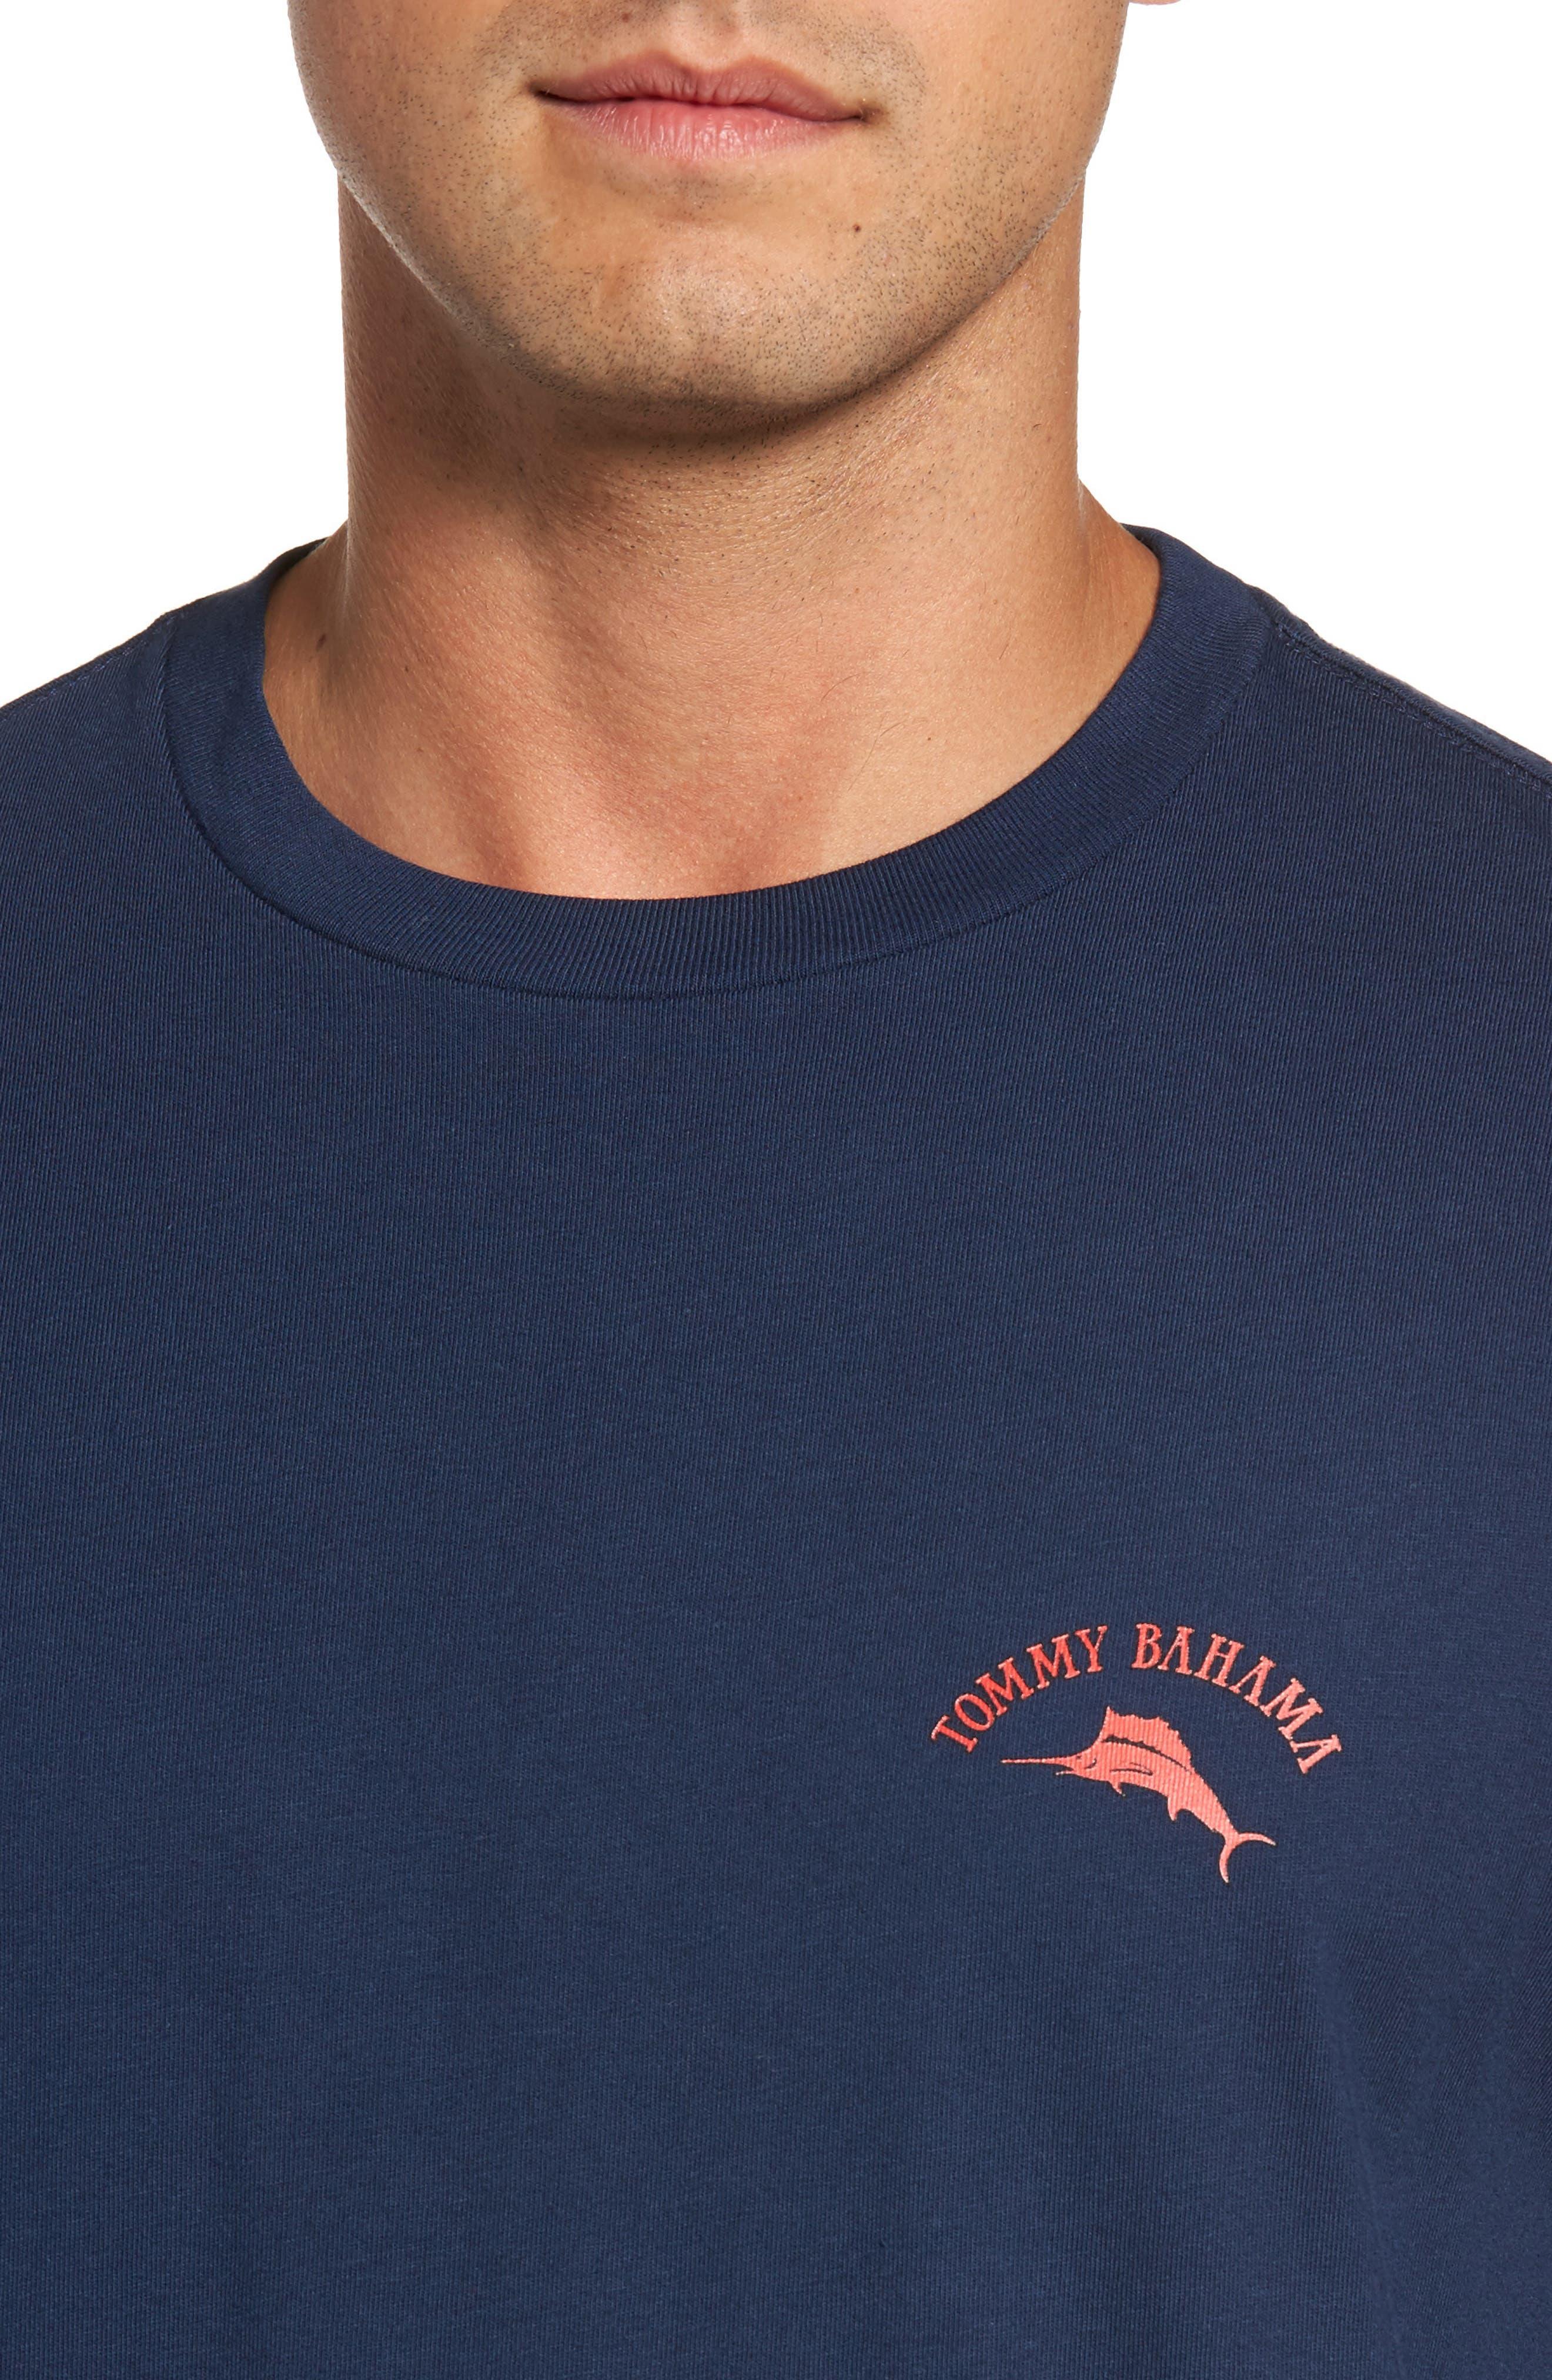 Big Boats Standard Fit T-Shirt,                             Alternate thumbnail 4, color,                             401